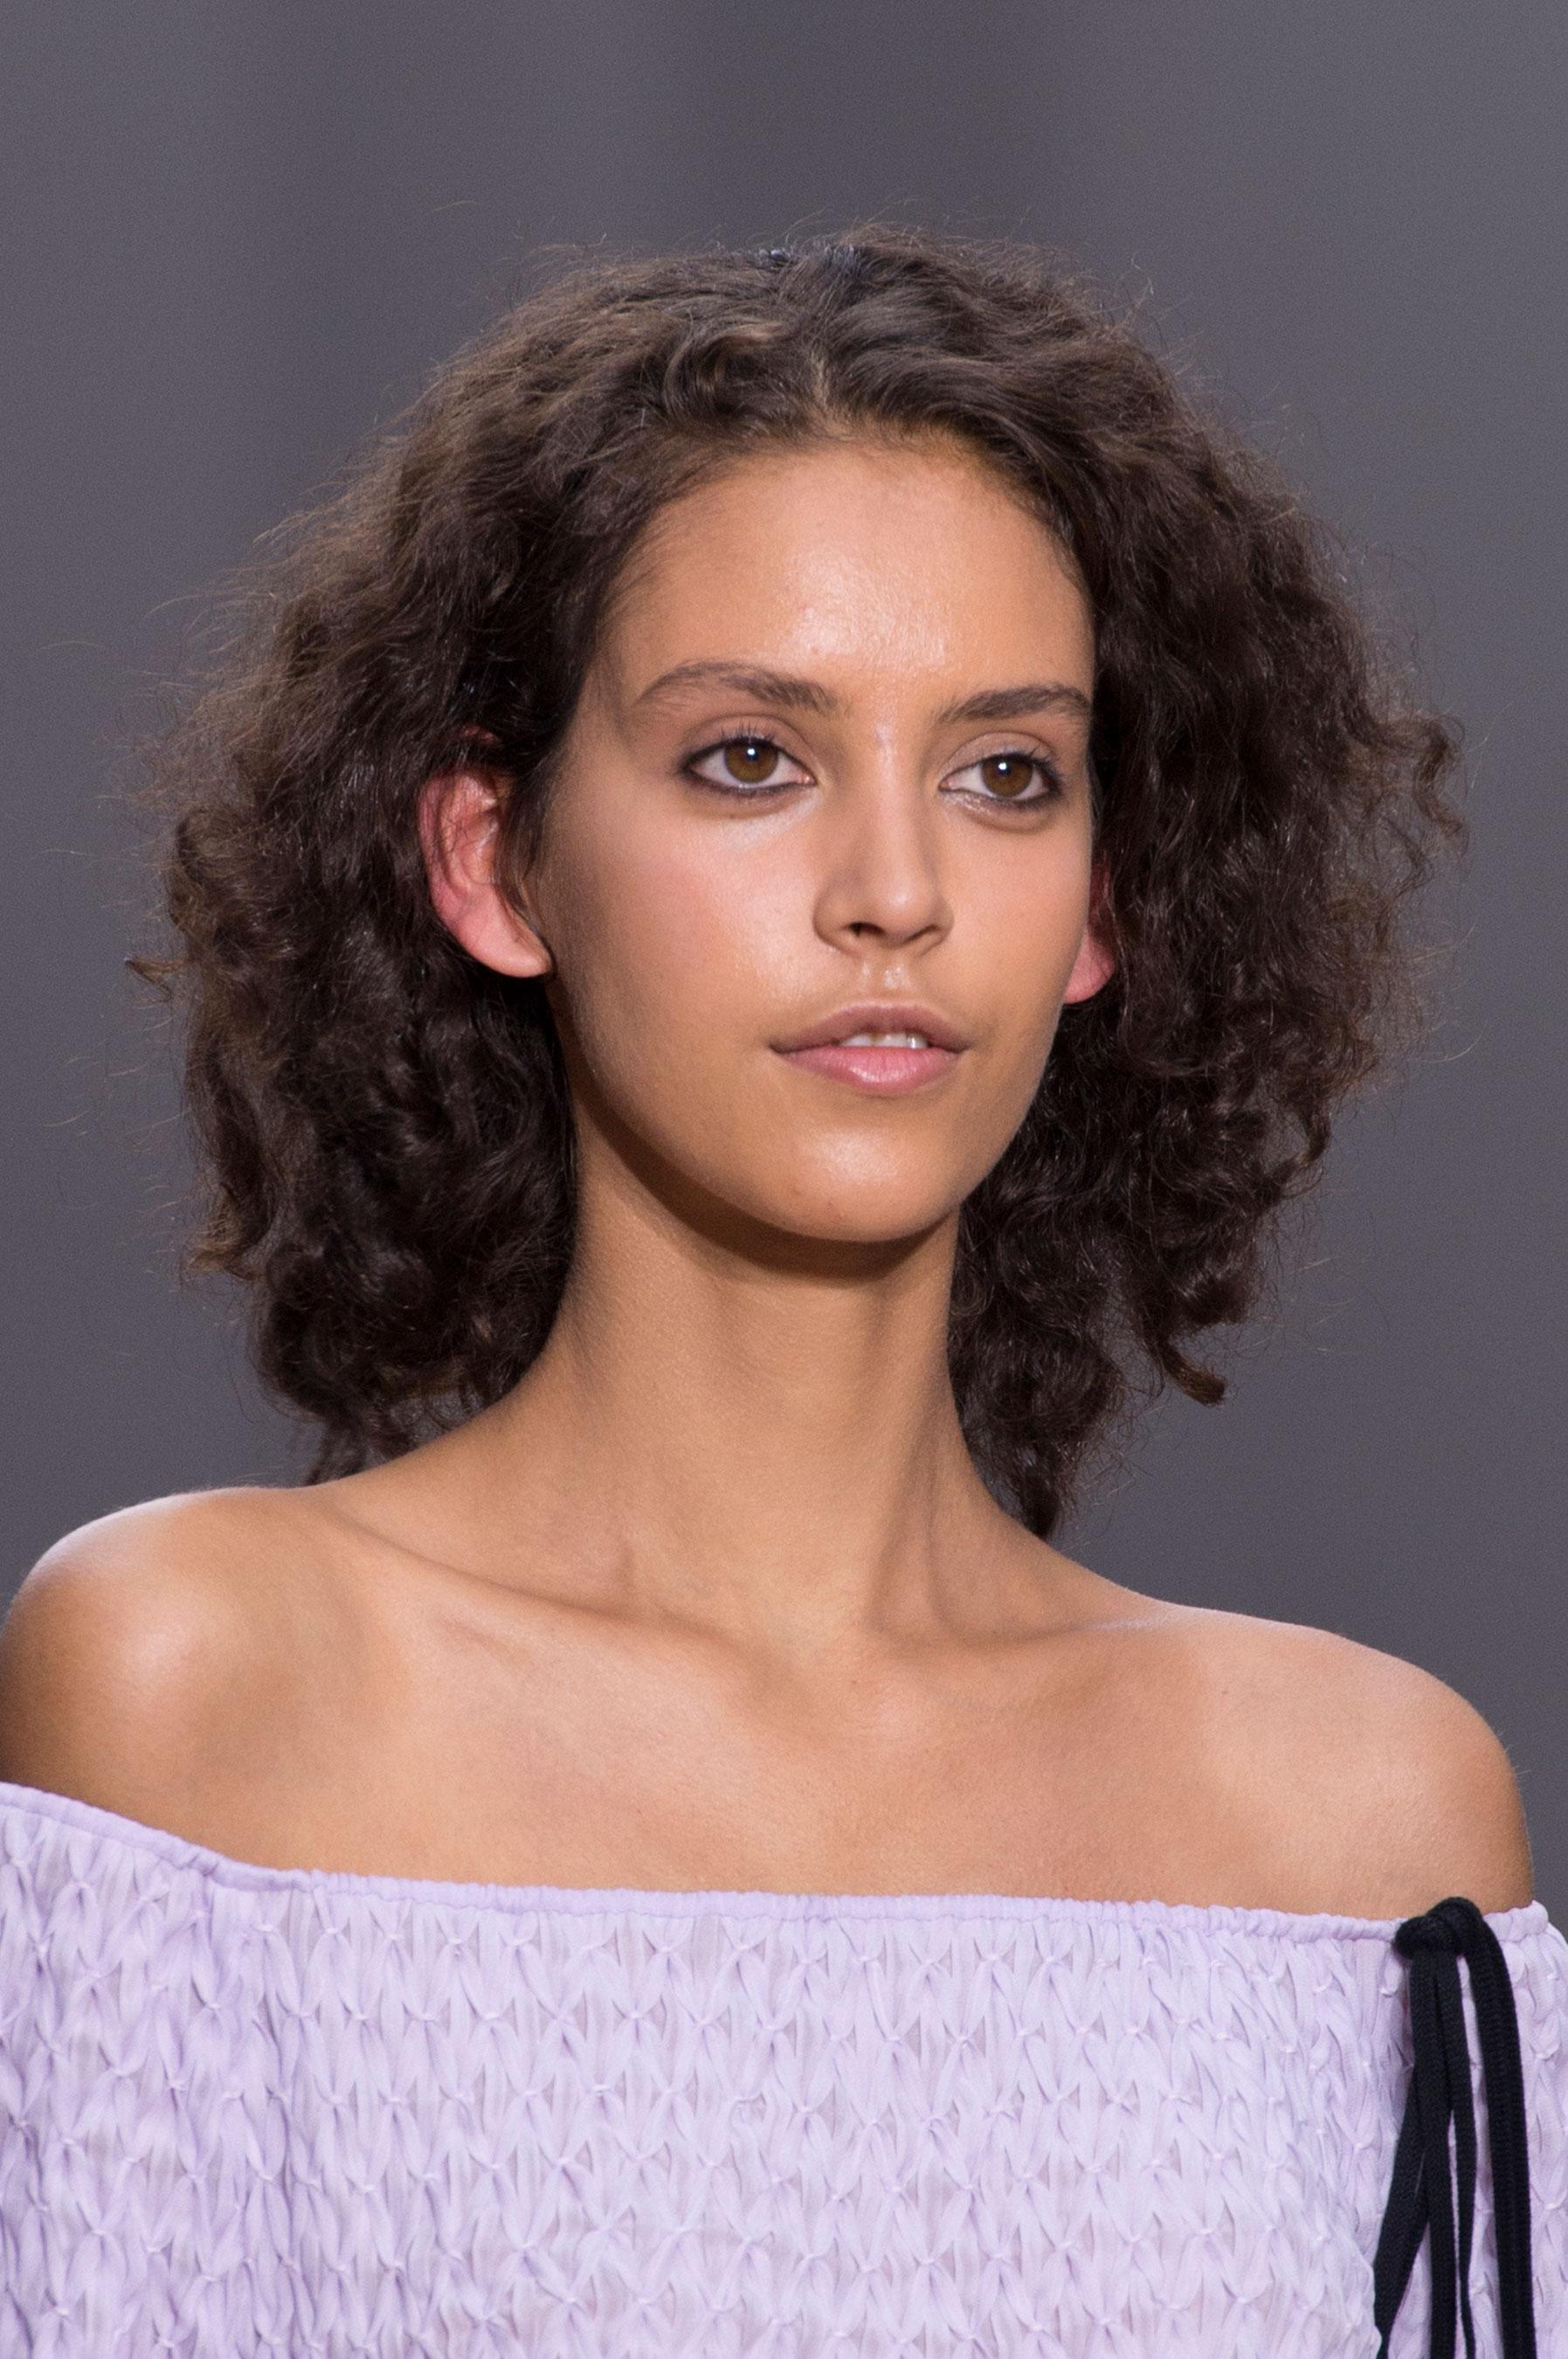 Chloe-spring-2016-runway-beauty-fashion-show-the-impression-11